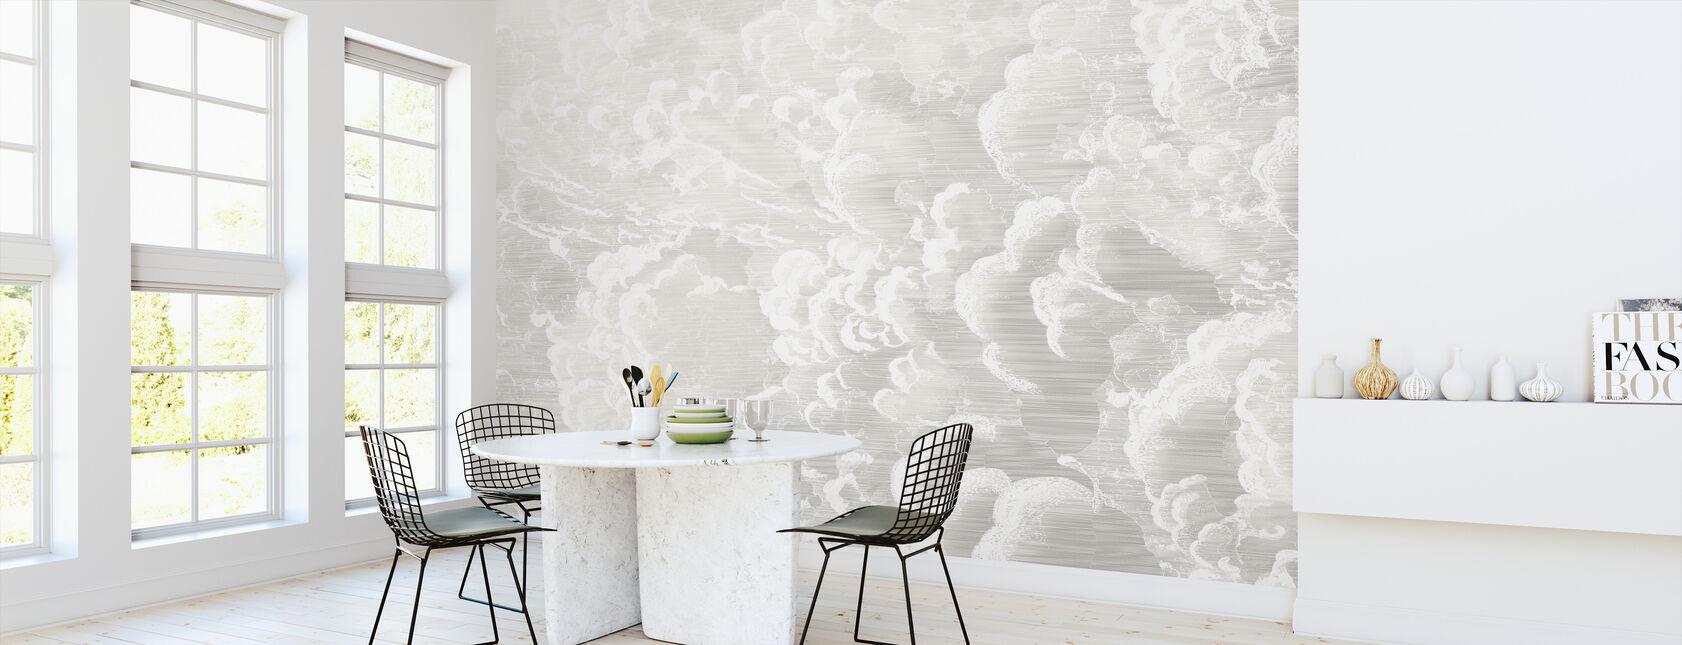 Cradled in Clouds - Pastel - Wallpaper - Kitchen